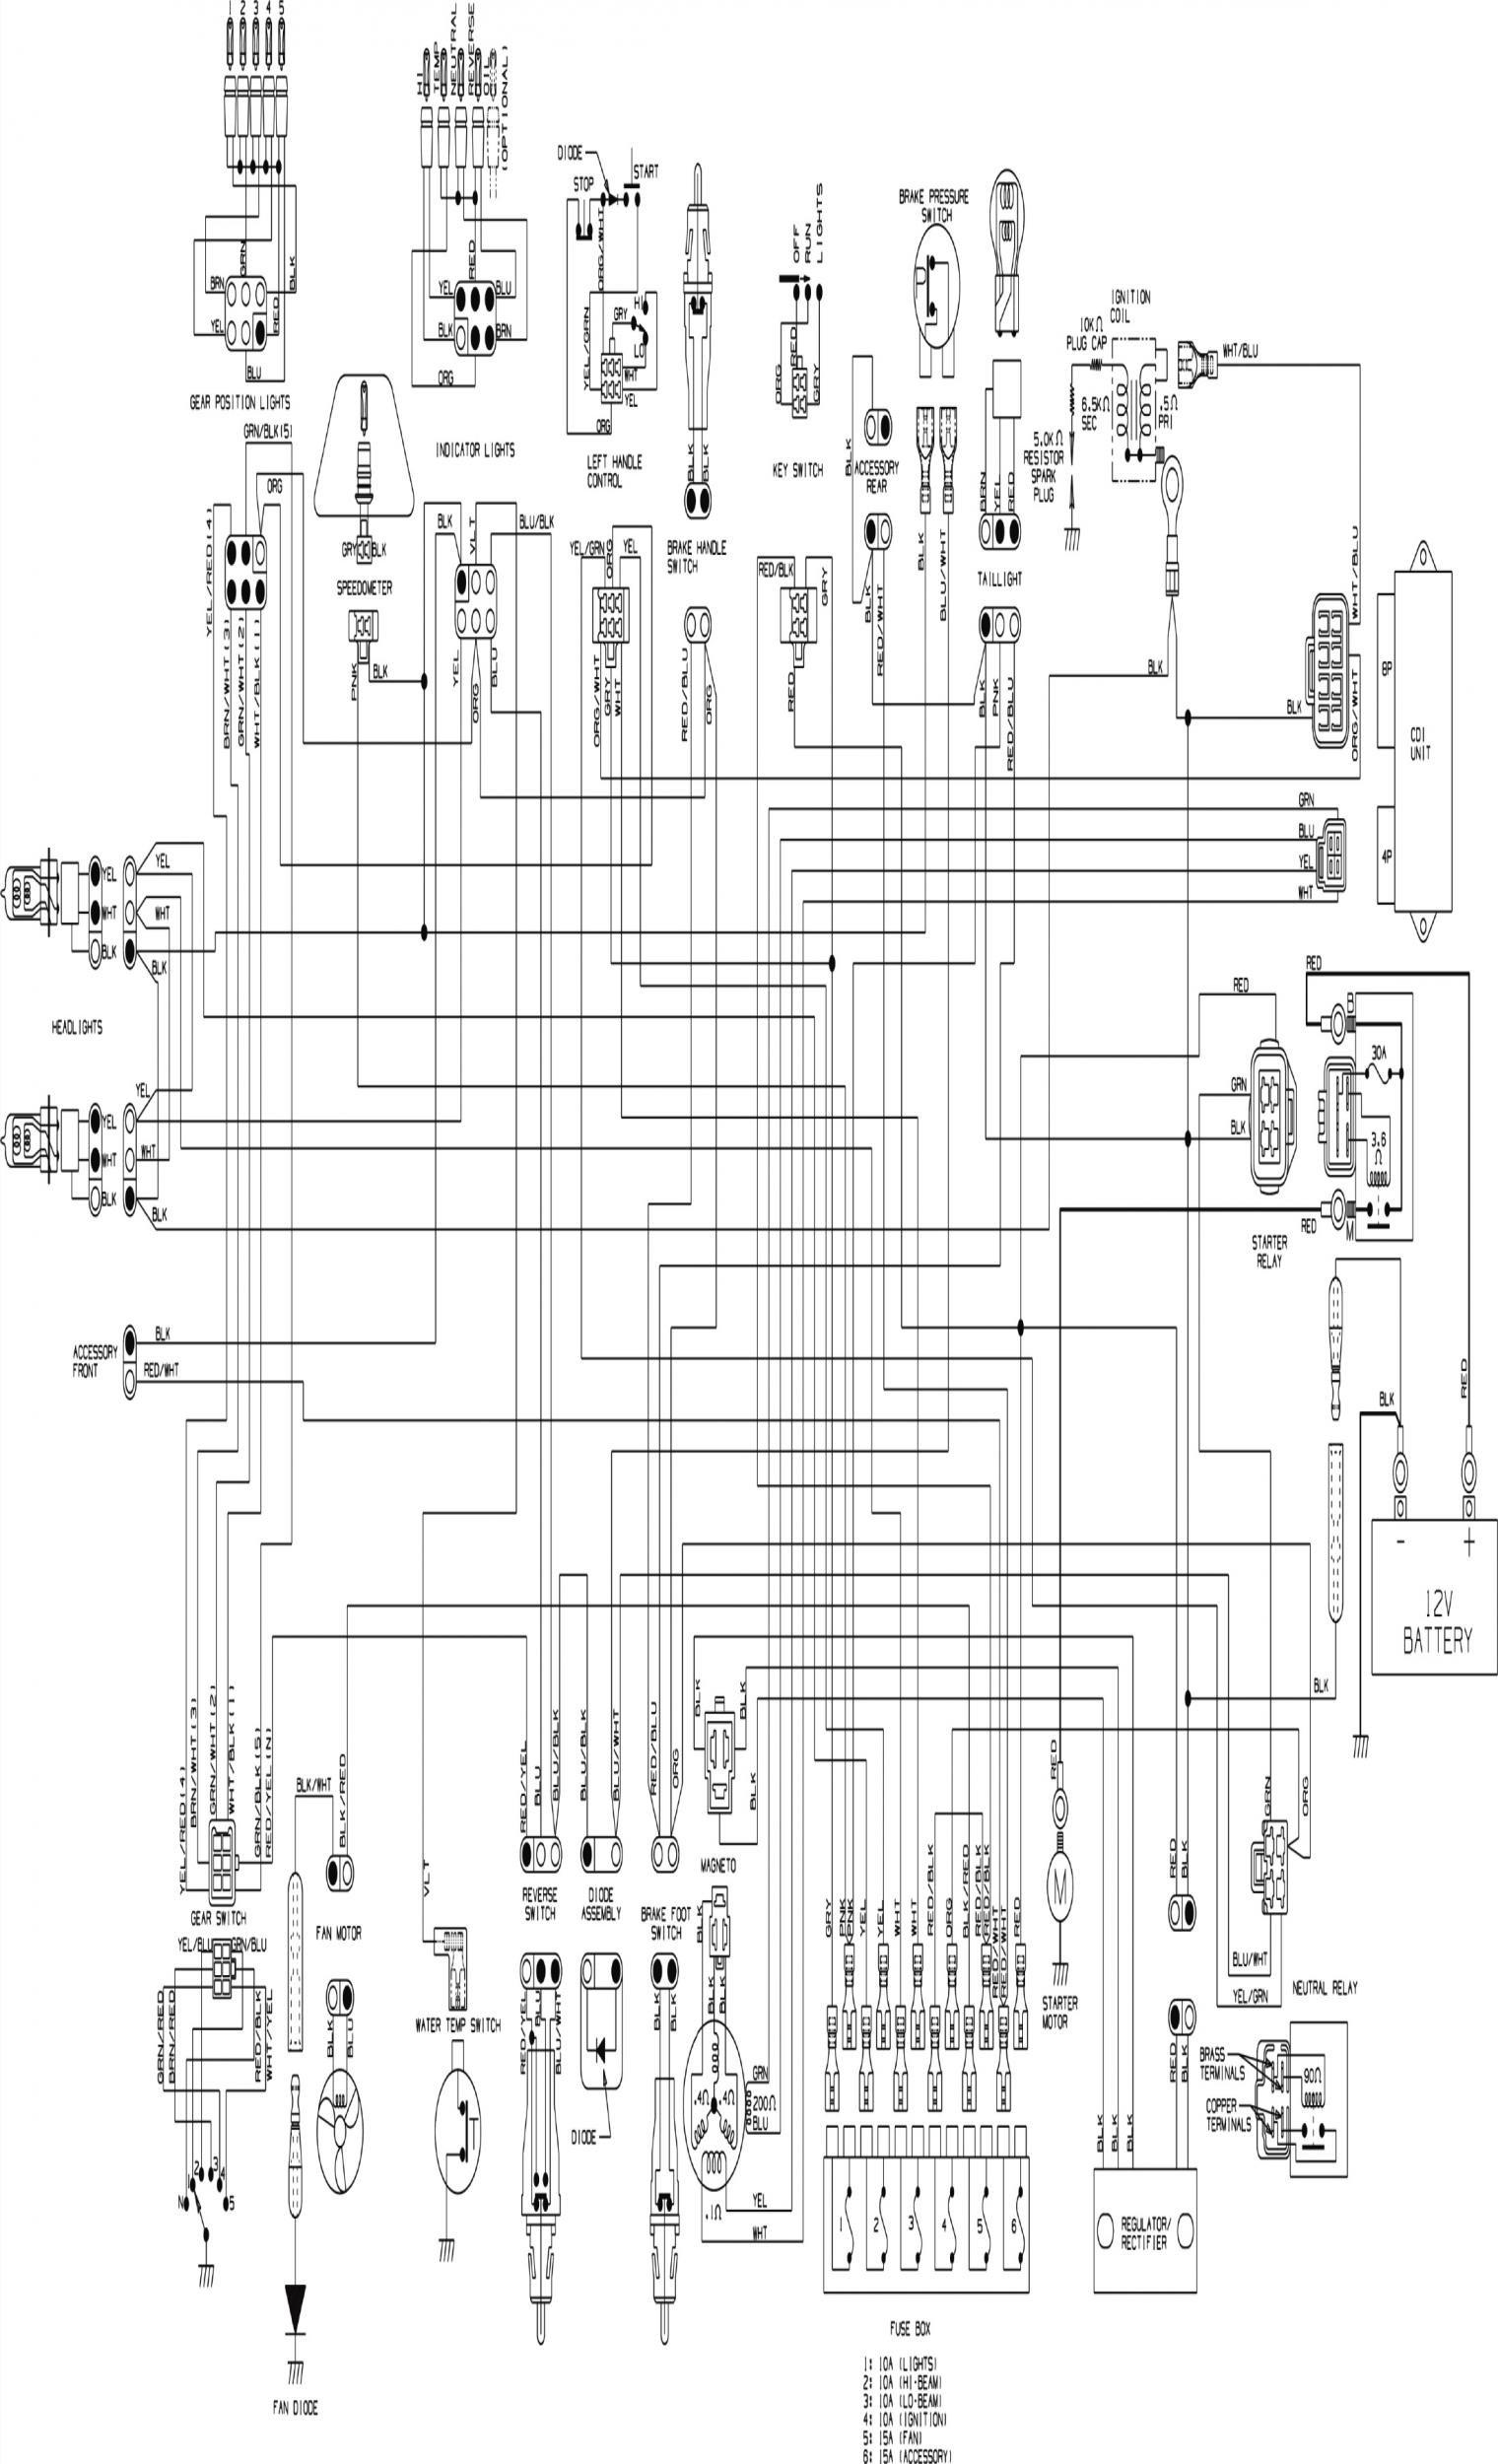 2000 Arctic Cat 400 Wiring Diagram - Harley Dyna Fuse Diagram for Wiring  Diagram Schematics